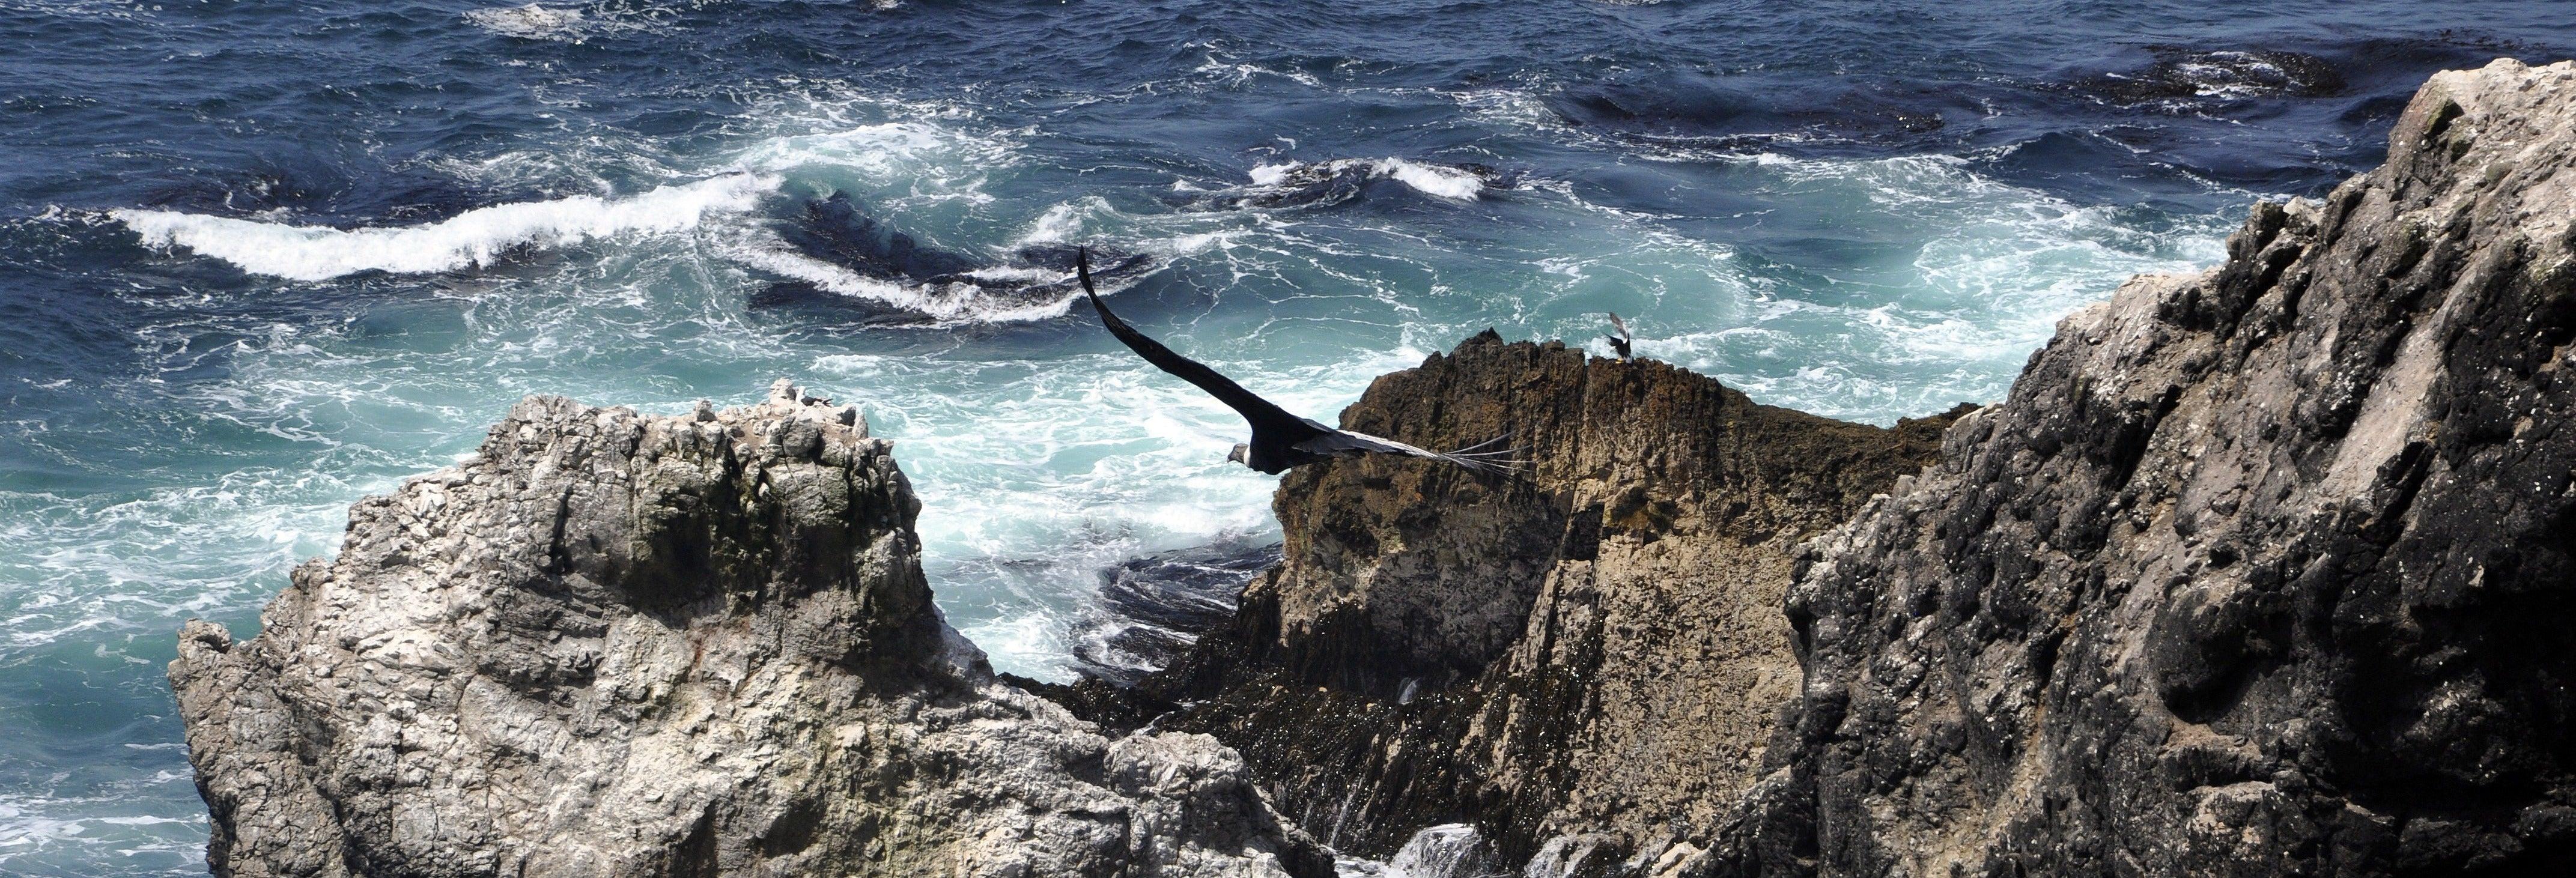 Excursion à la Bahía San Fernando + Sandboard à Nazca